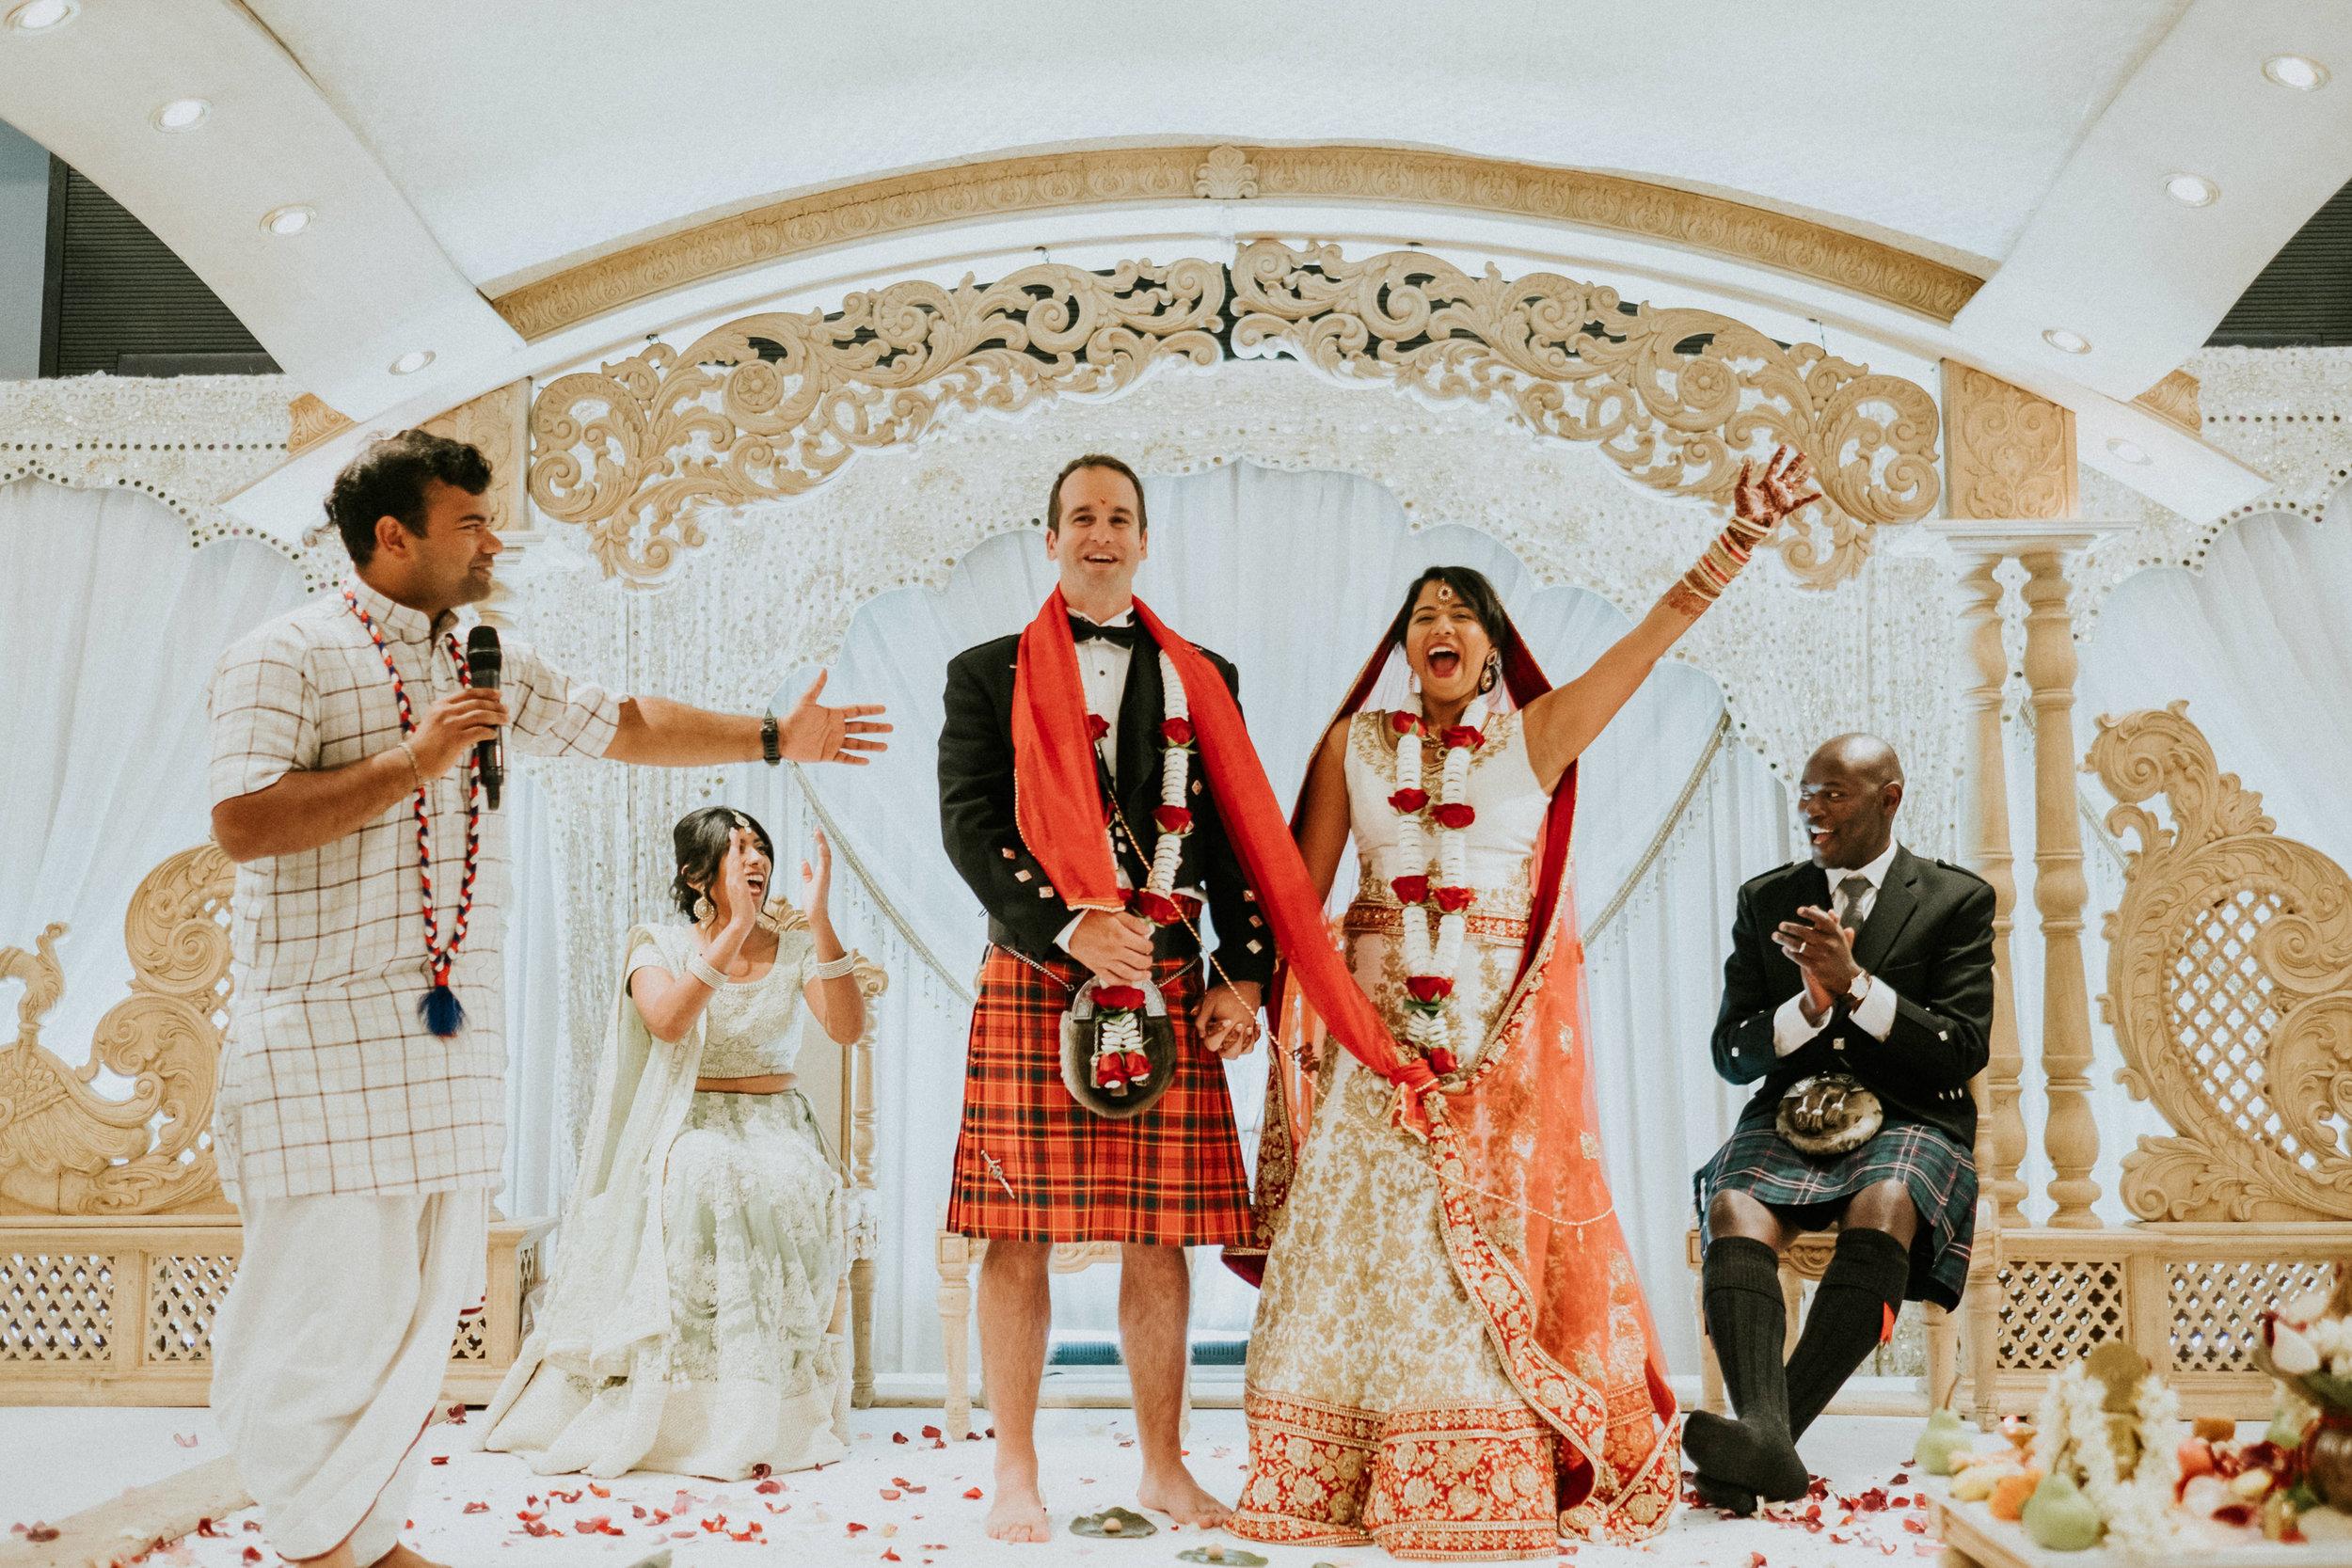 81 Indian fusion wedding alternative joanna nicole photography3.jpg